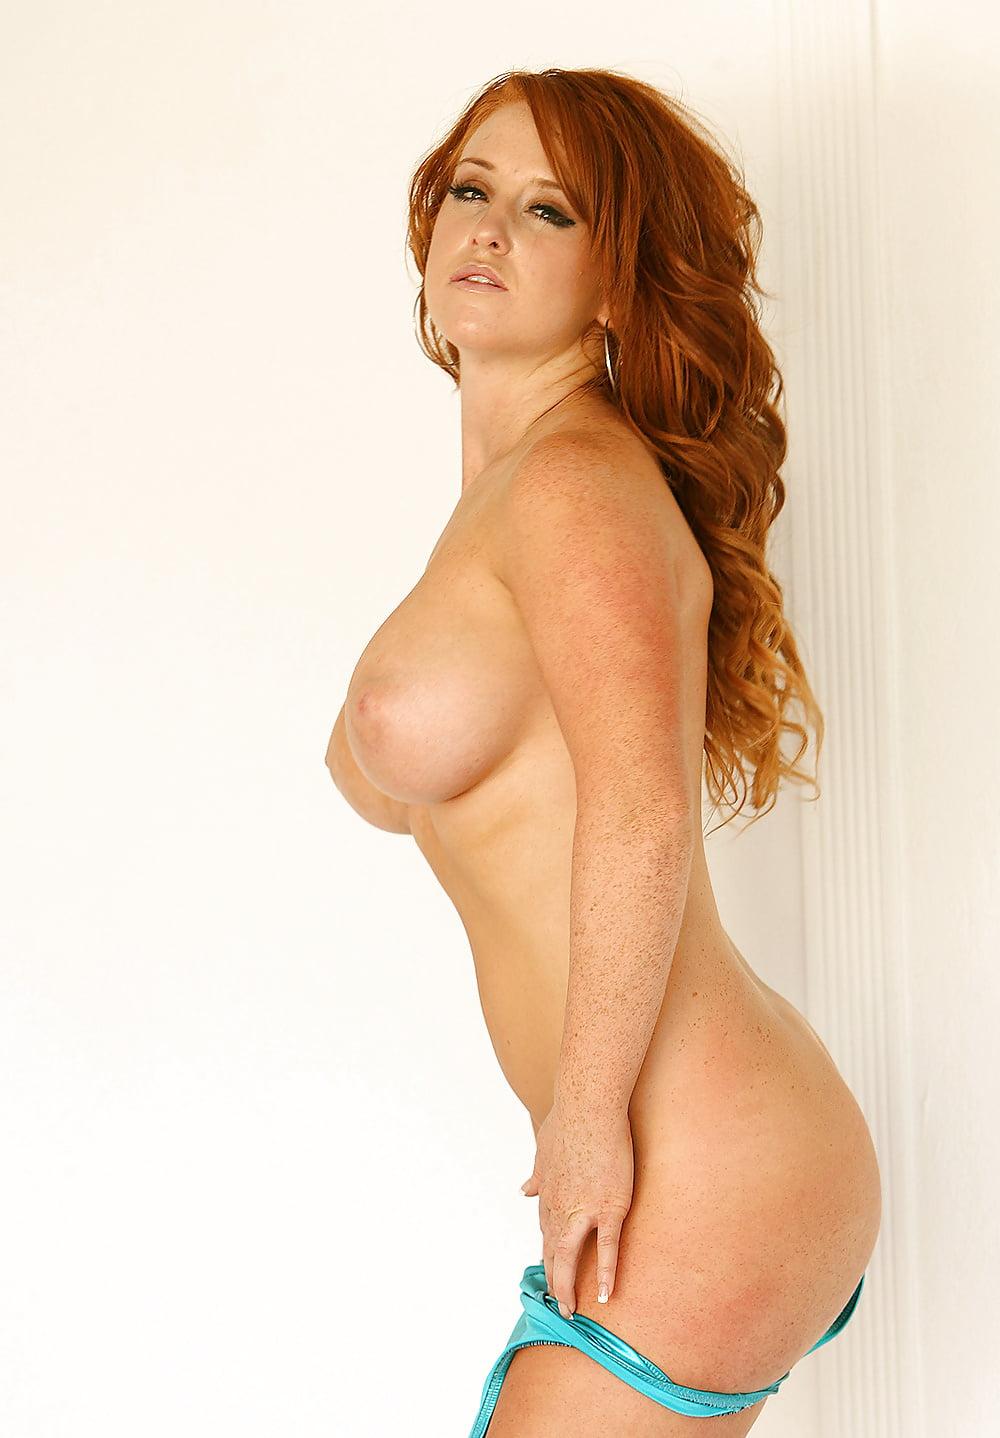 Redhead whore